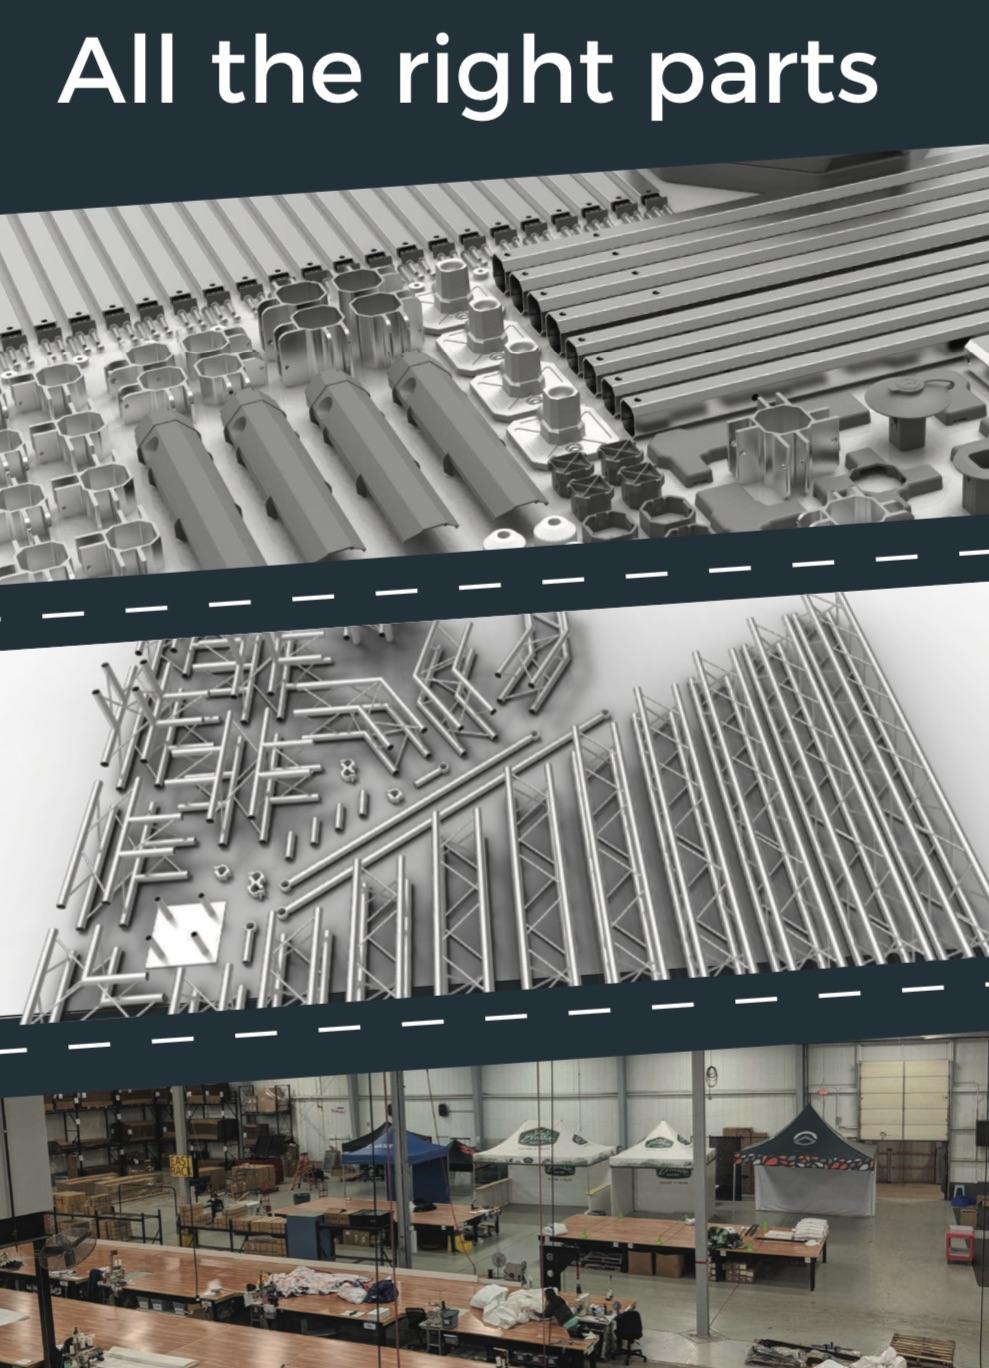 experiential marketing fabrication capabilities